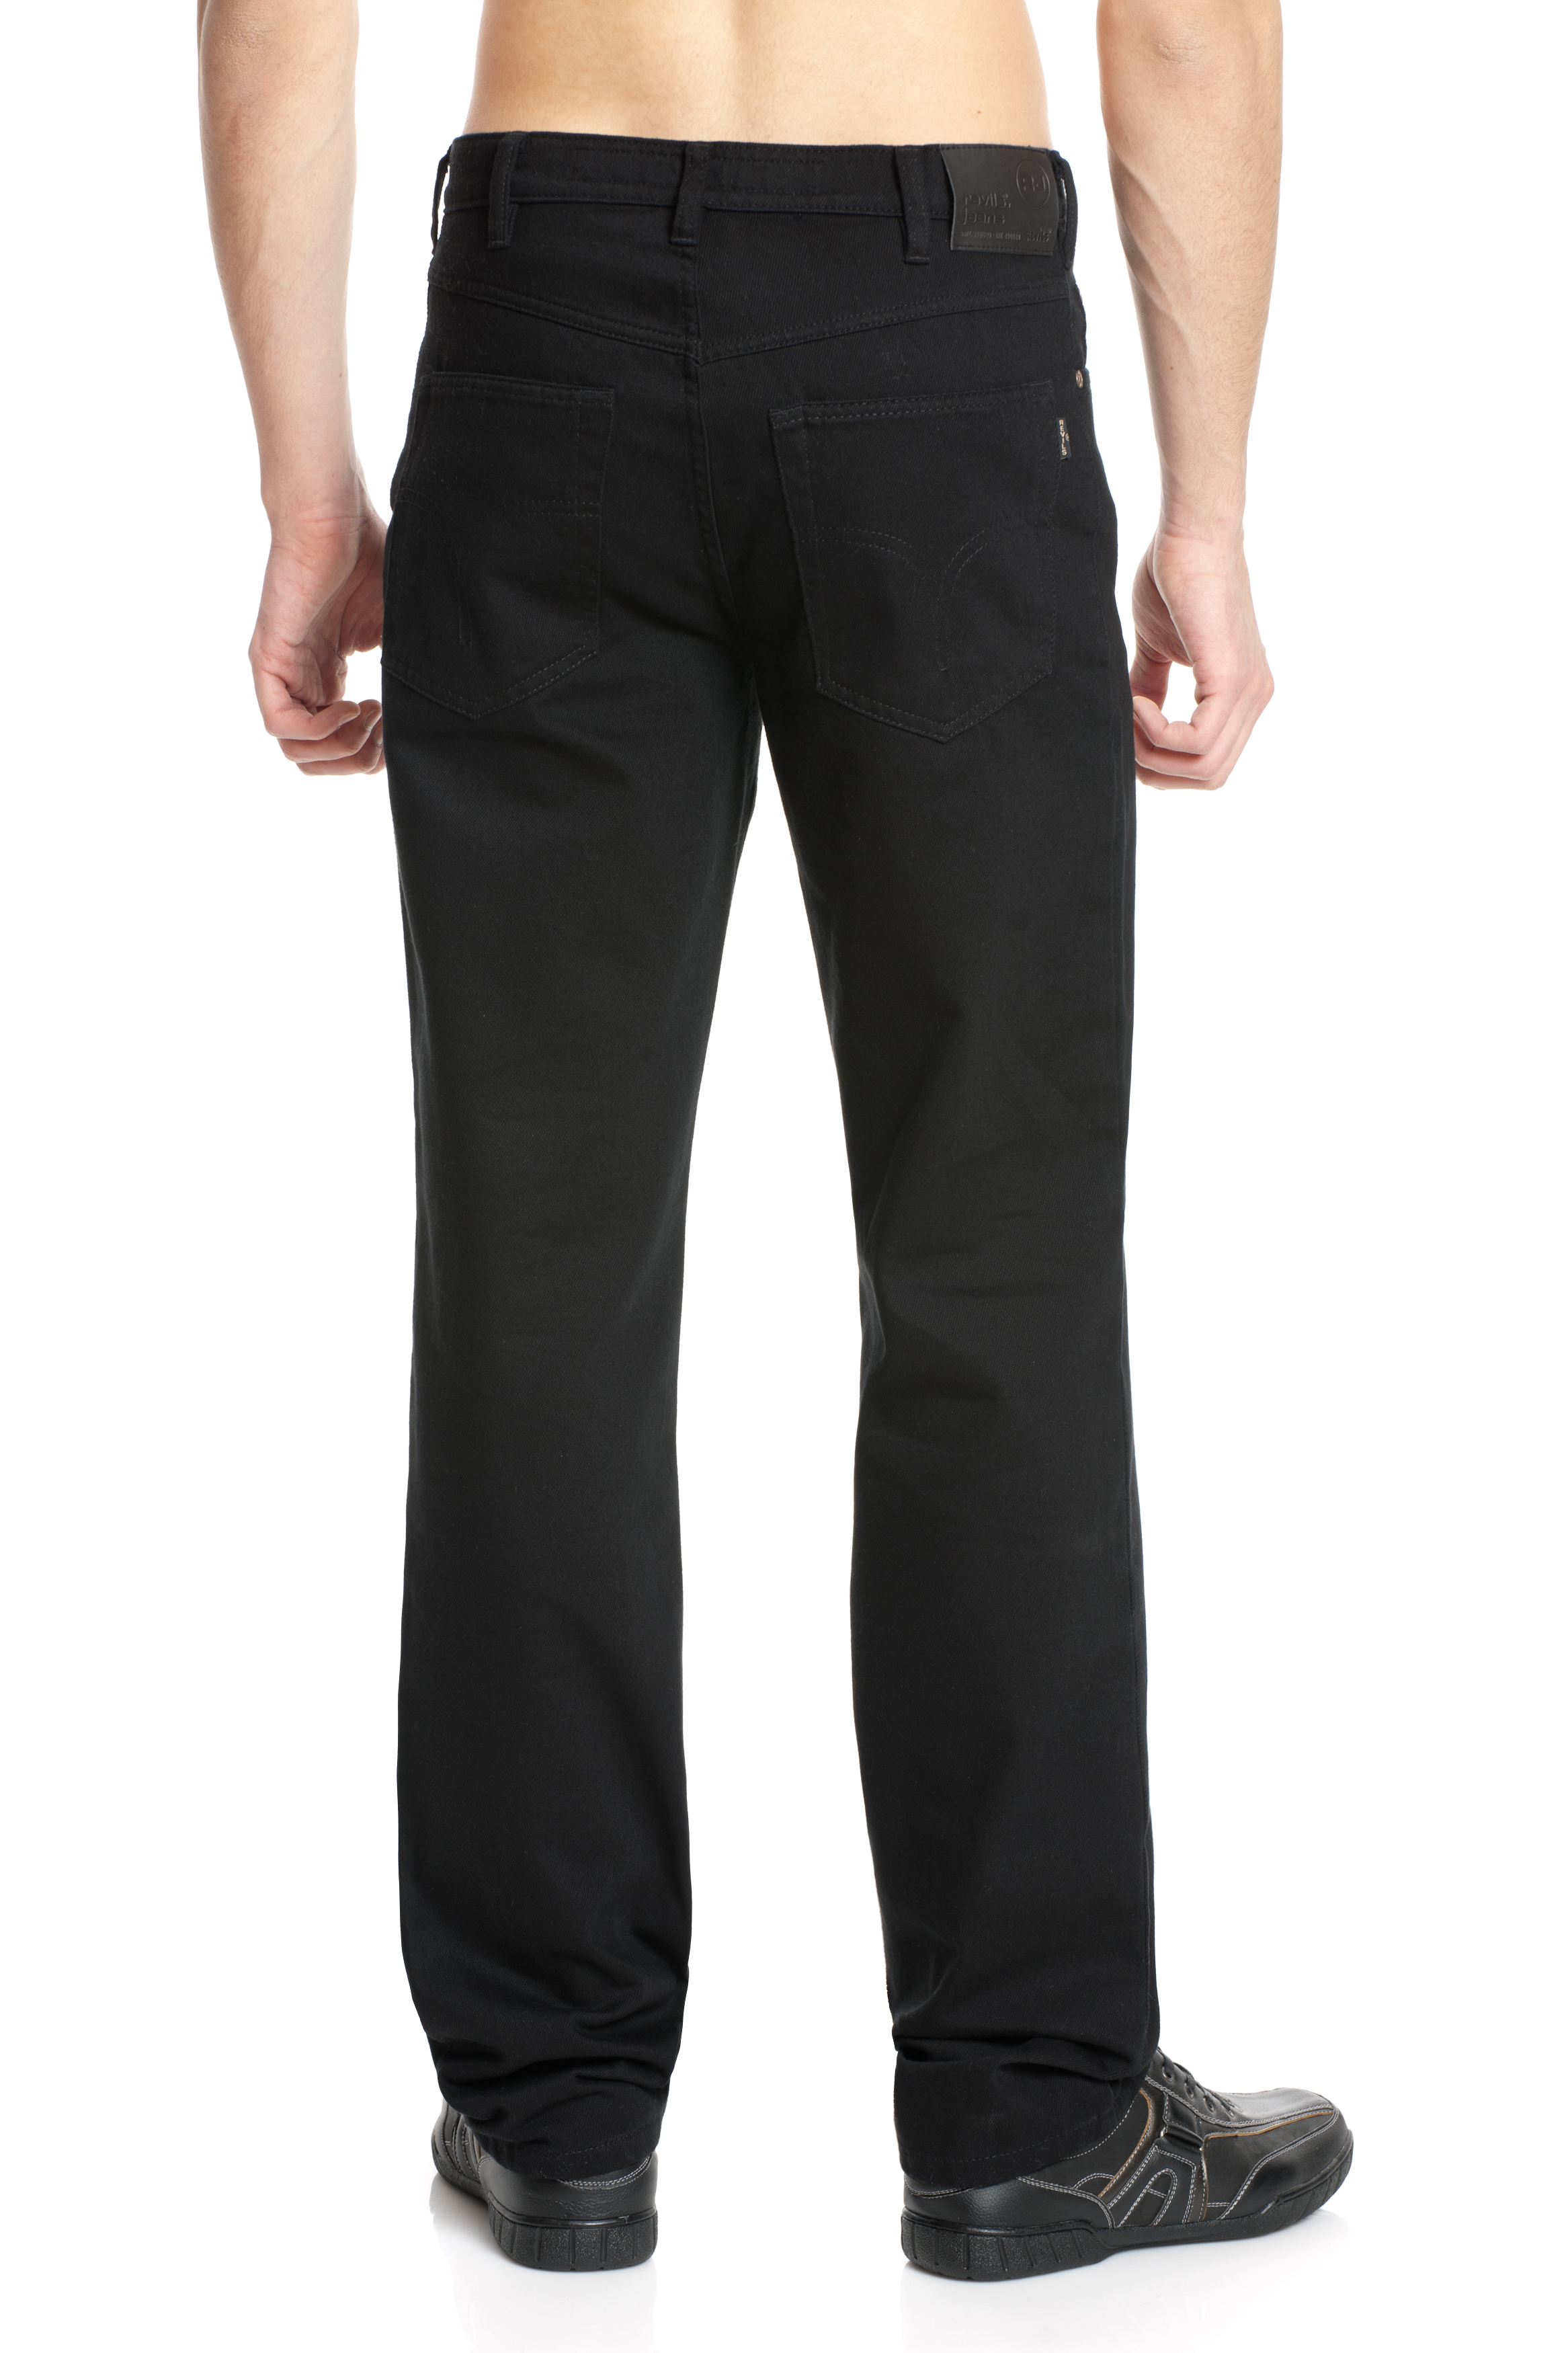 Revils 606 Stretch Comfort Jeans bis Länge 40